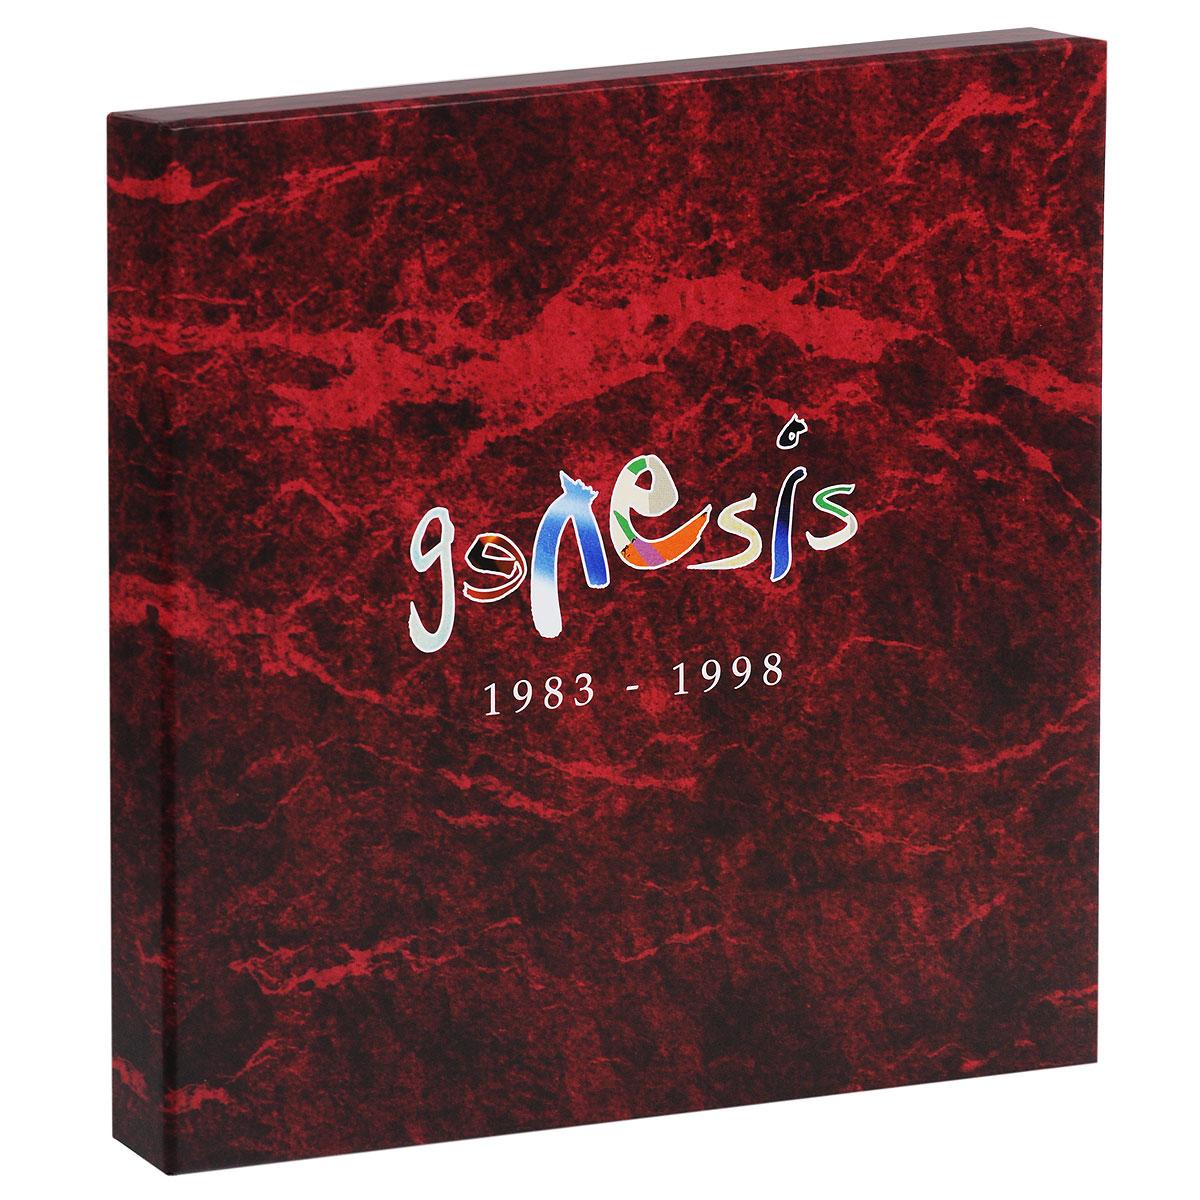 Genesis. 1983-1998. Limited Edition (6 LP)